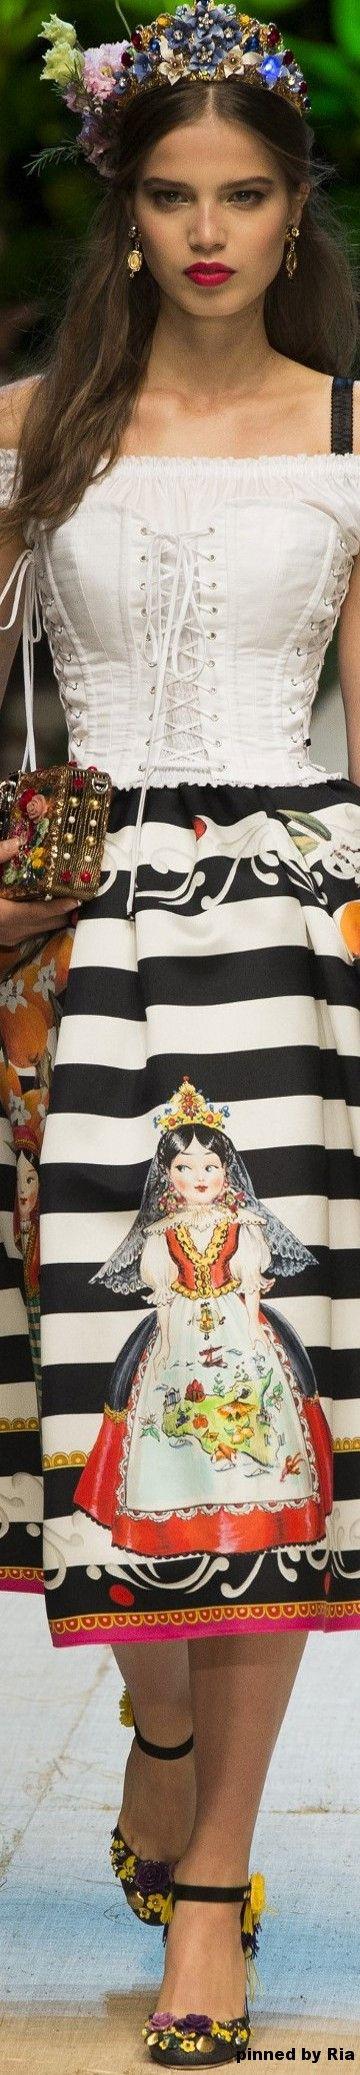 Dolce & Gabbana Spring Summer 2017 RTW l Ria